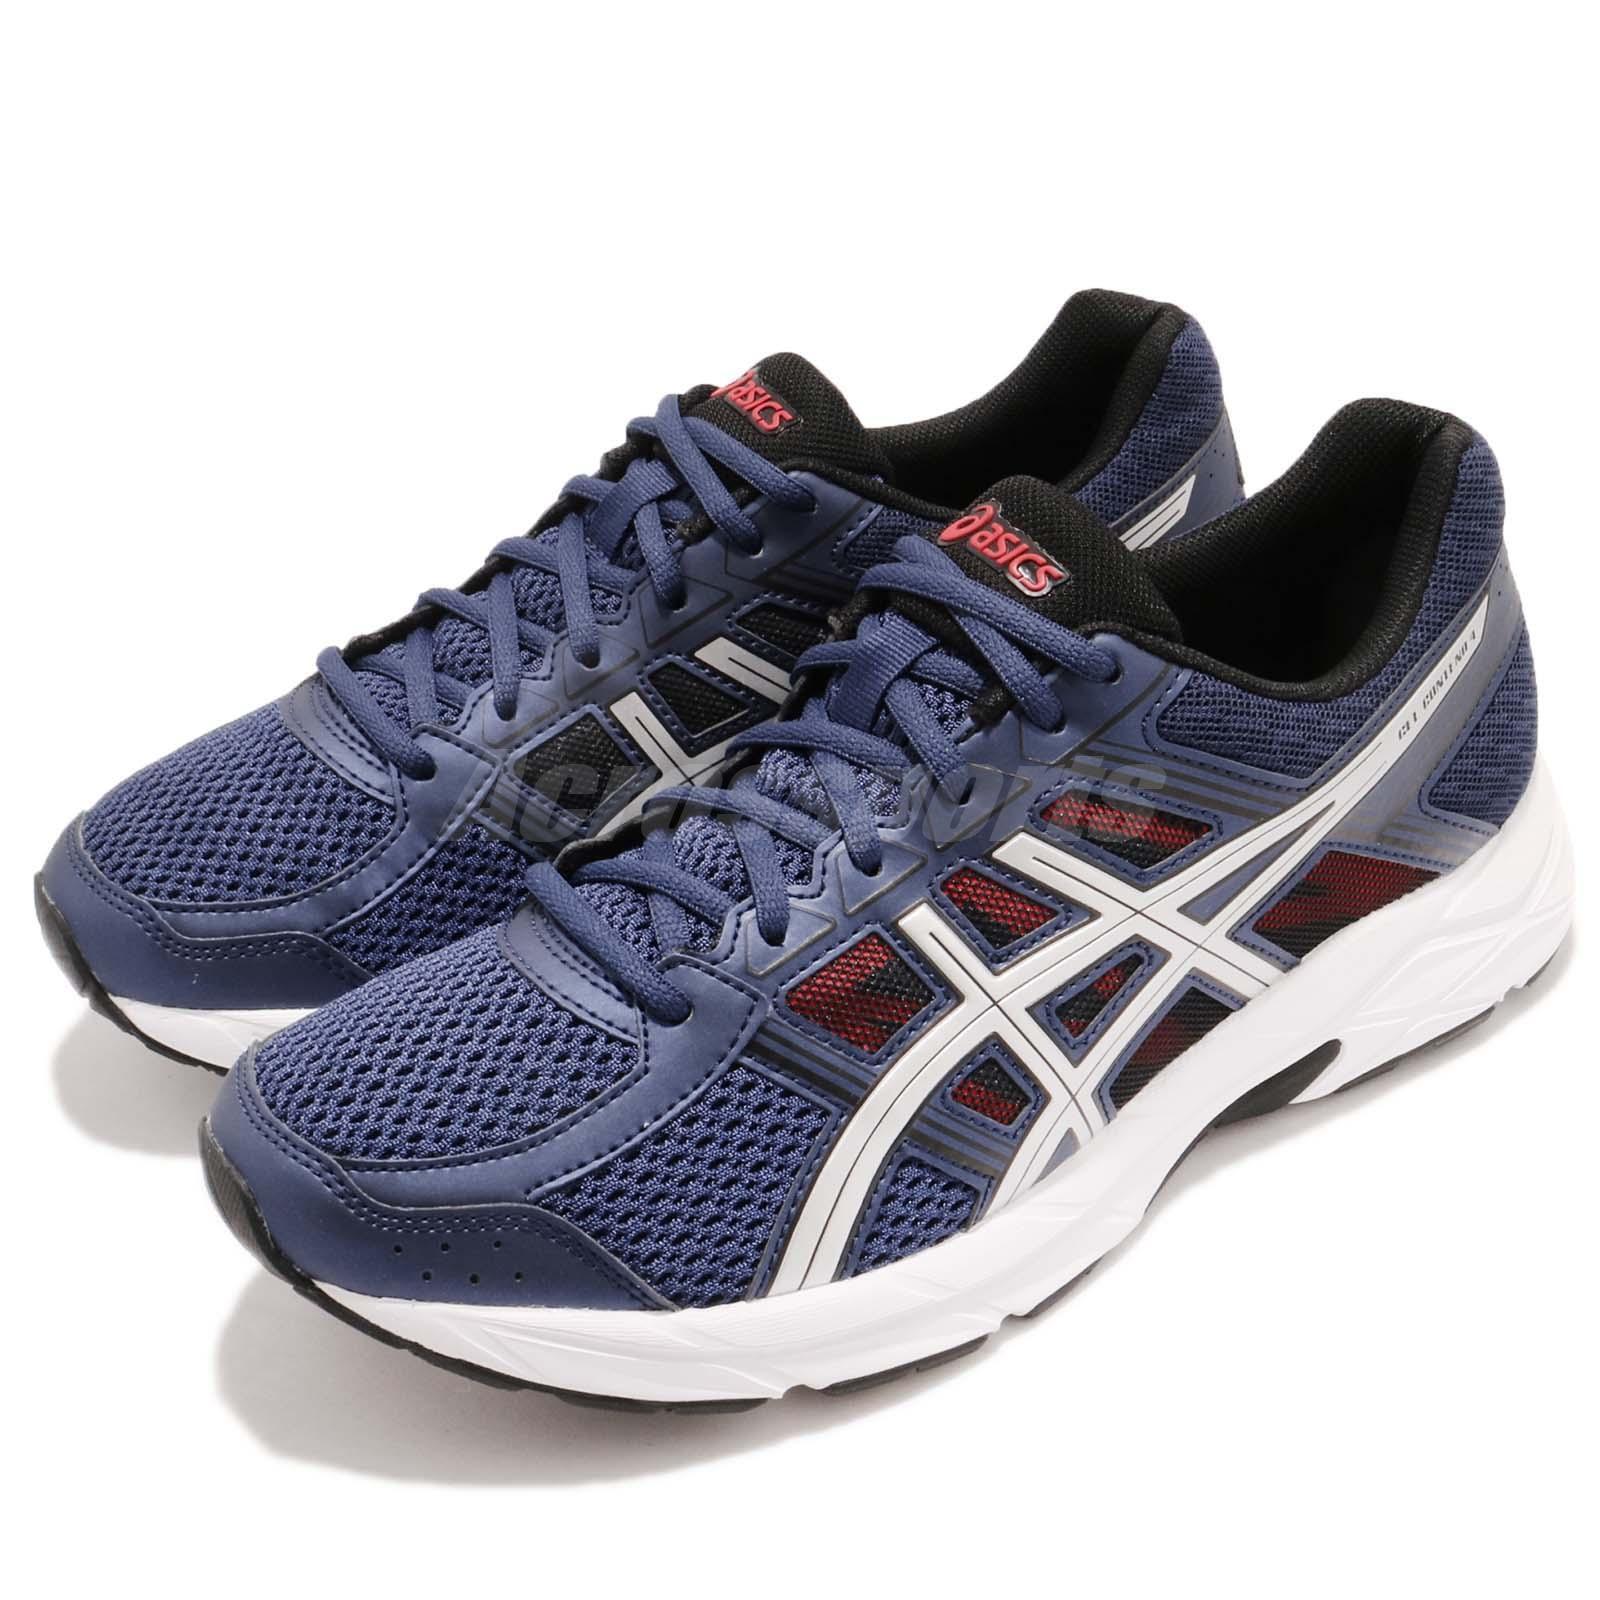 Asics Gel-Contend 4 Deep Ocean plata blanco Men Running zapatos zapatillas T715-N400